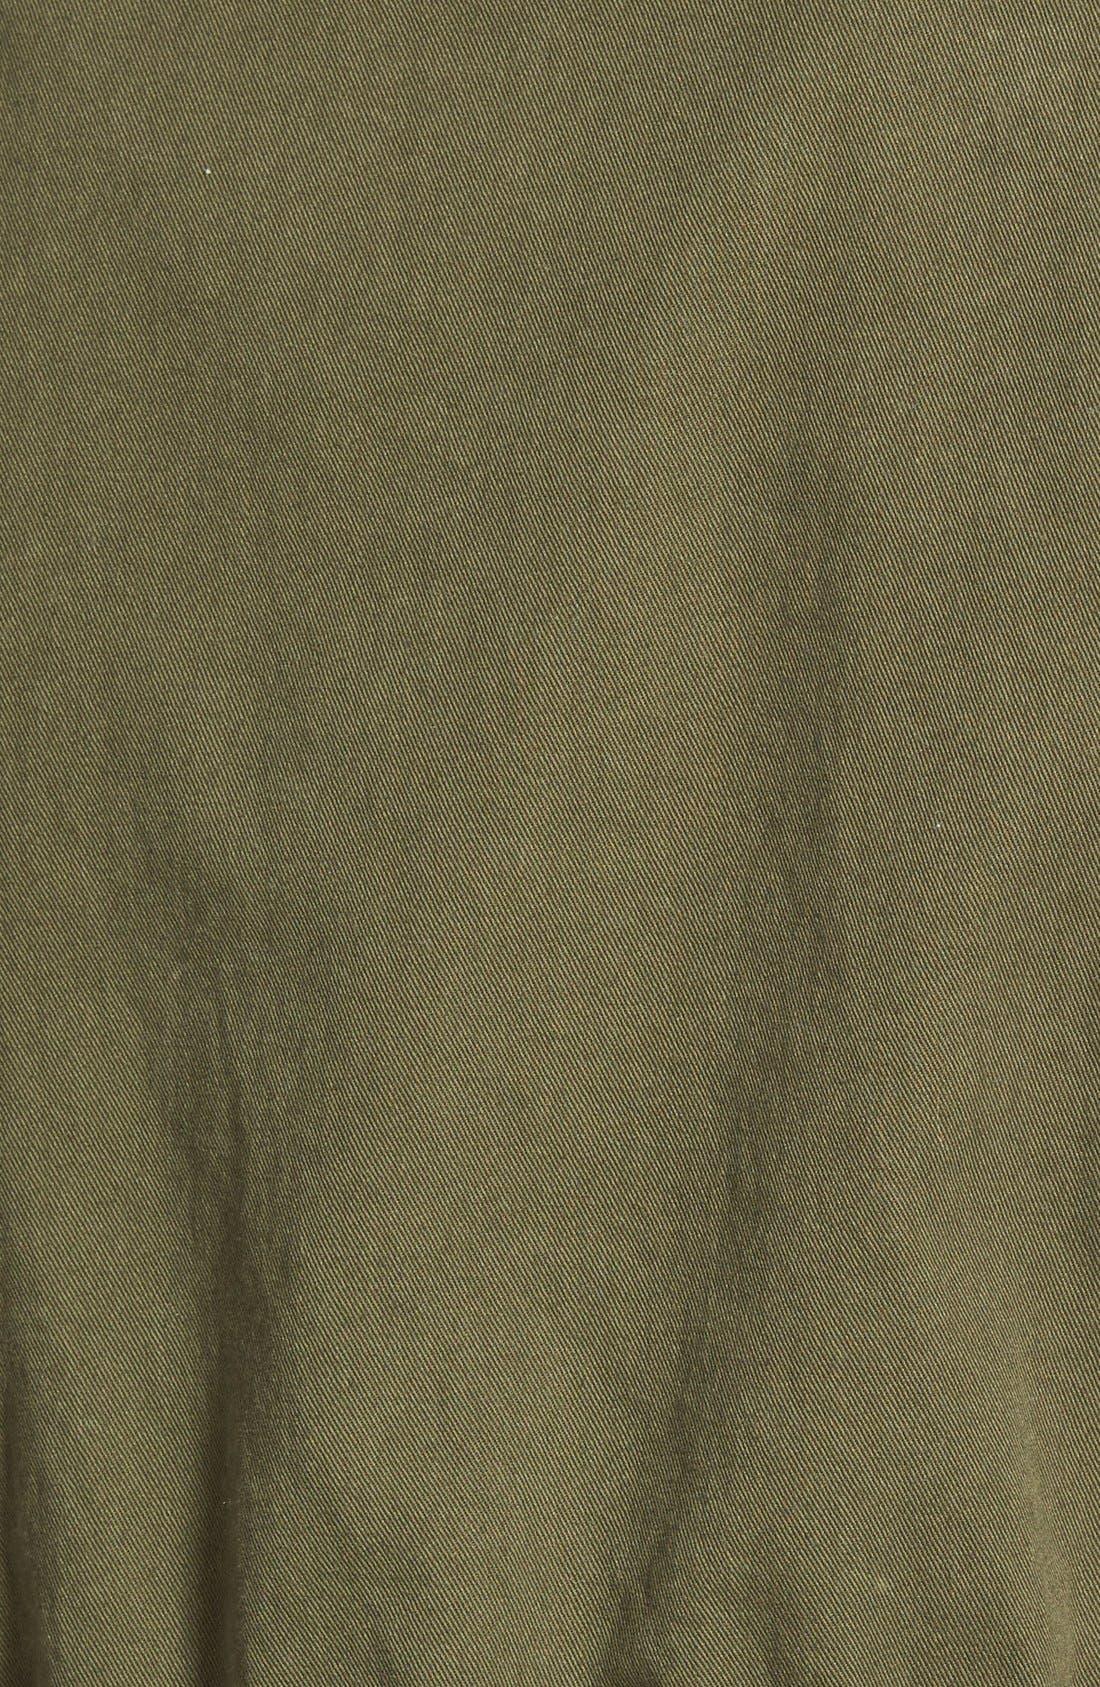 Alternate Image 3  - Velvet Heritage Military Canvas Jacket